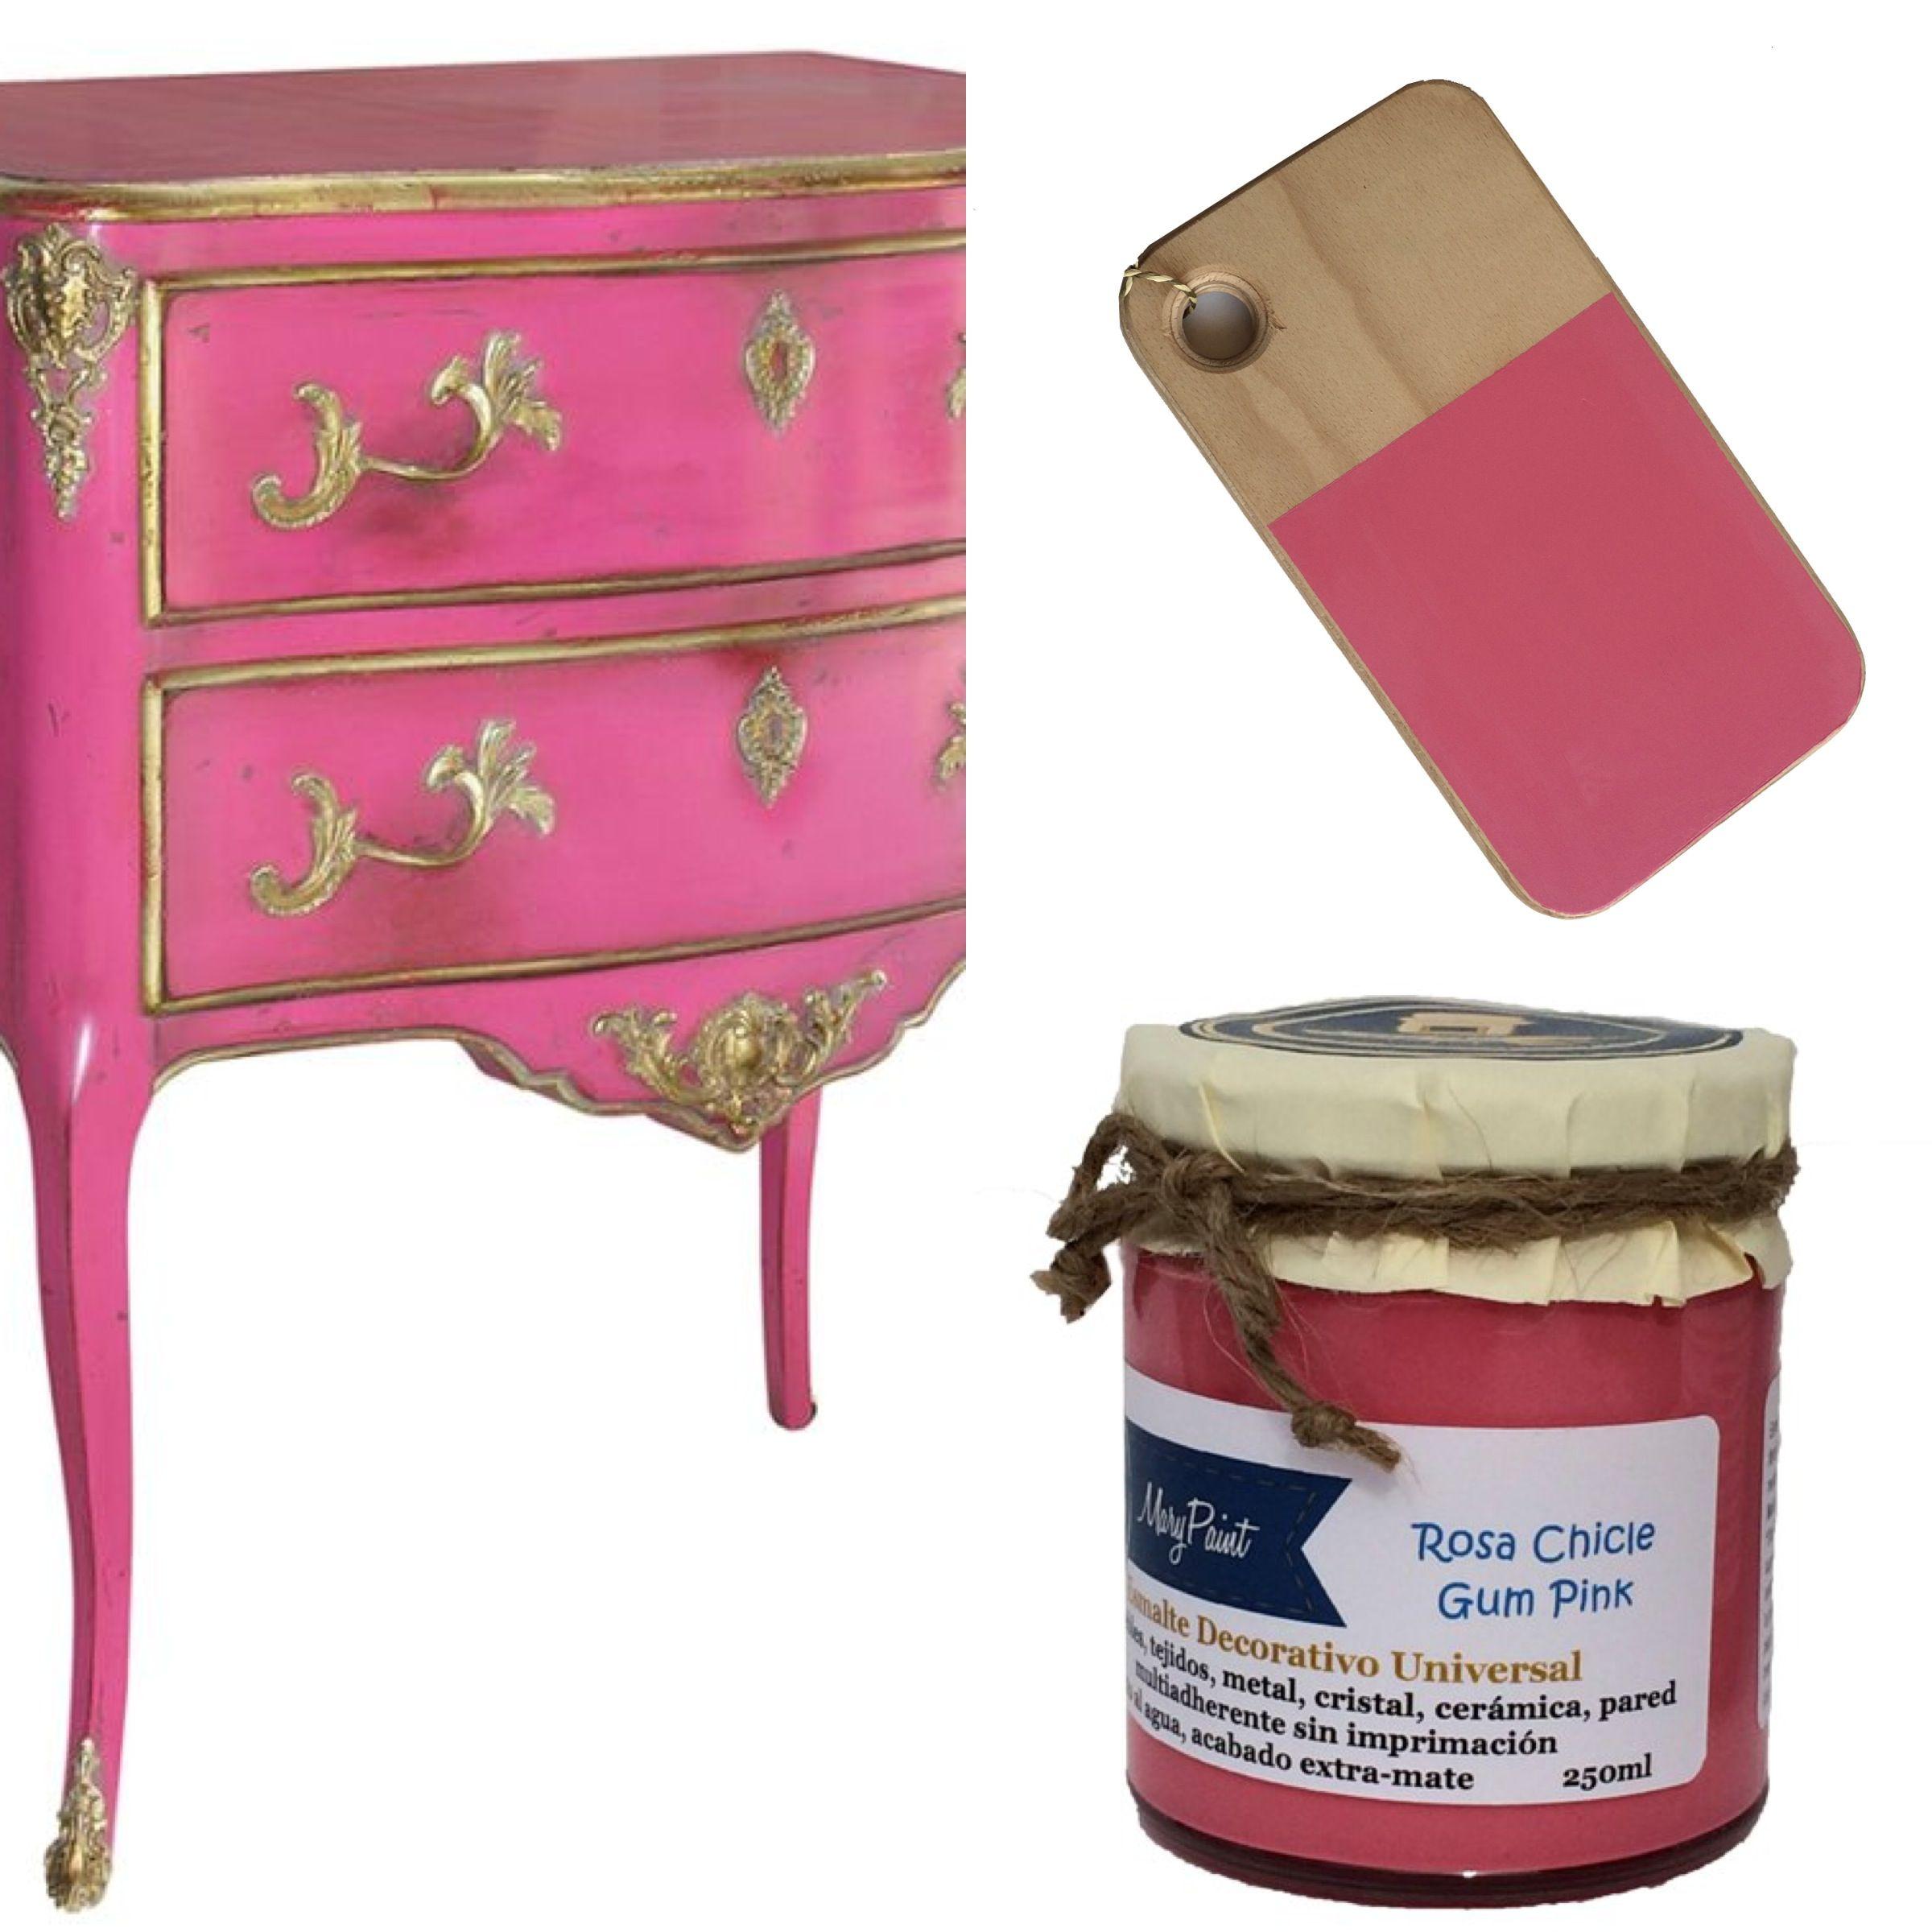 Muebles Rusticos Gume - Colores Mary Paint Marypaint Gum Pink Acabado Muebles [mjhdah]https://i.pinimg.com/originals/03/a4/18/03a4182f73f4e72639dfd40b83f1582f.png